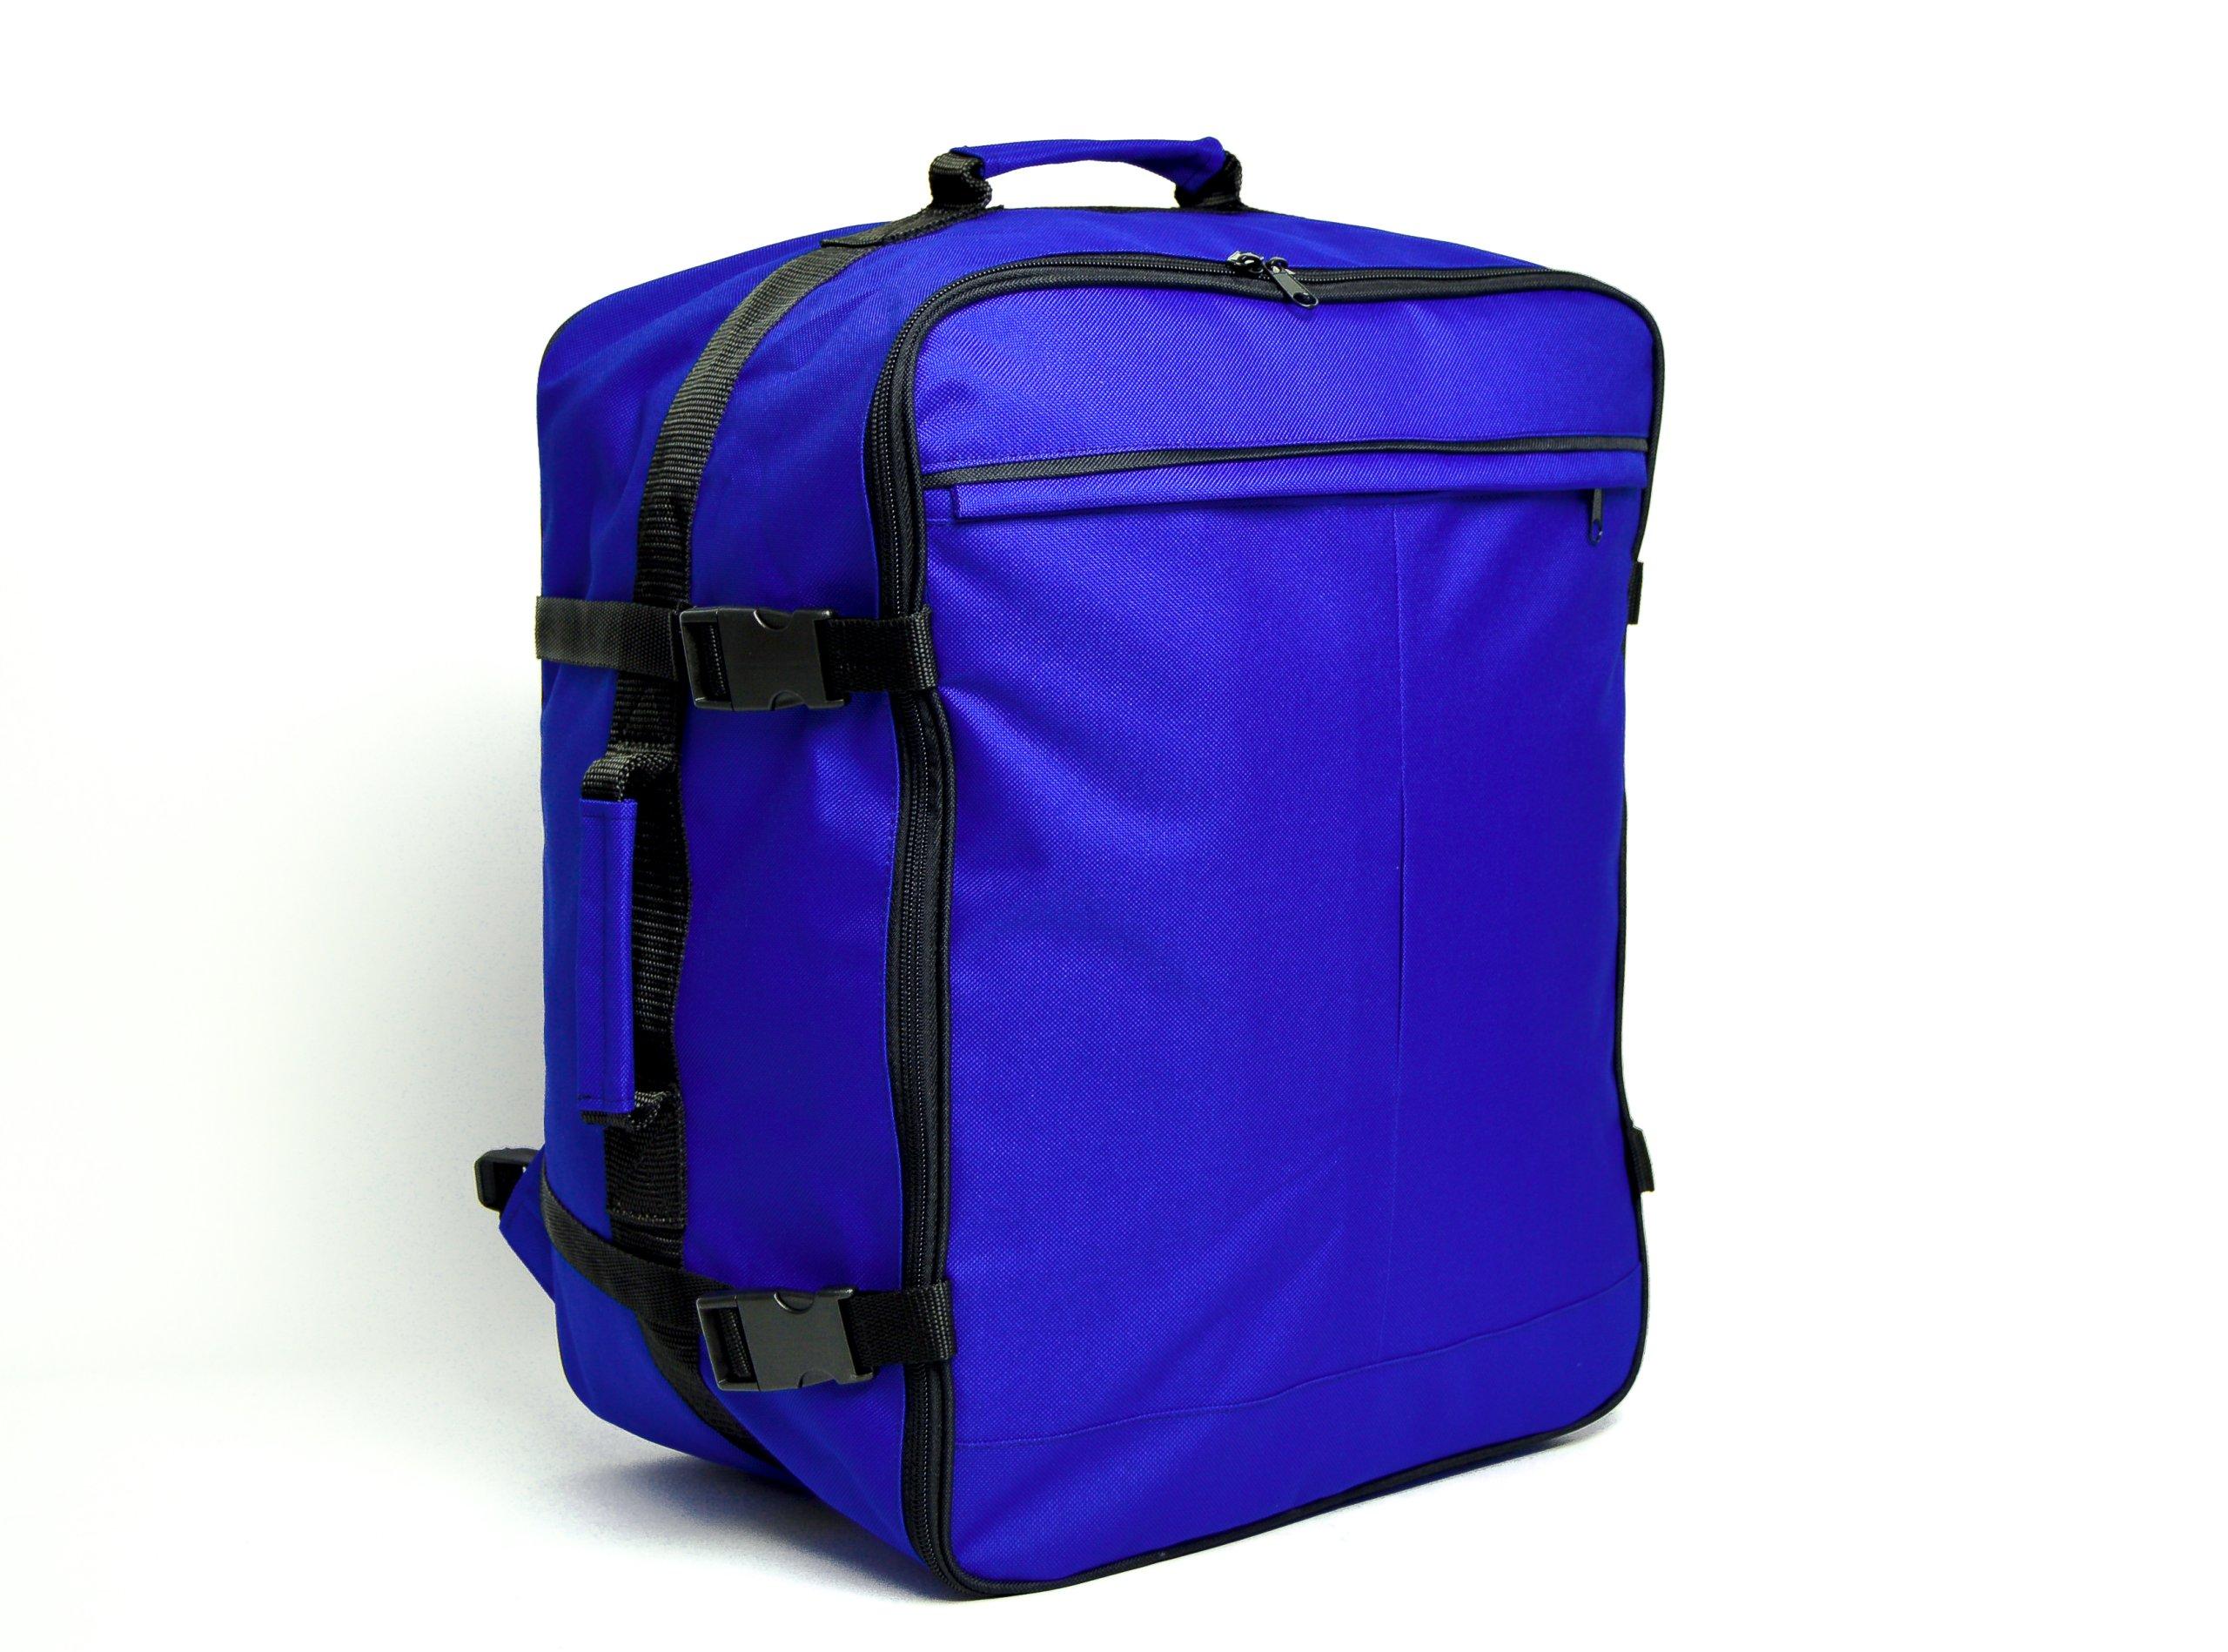 5288fba1b1db6 PLECAK do SAMOLOTU WizzAir 42x32x25 Torba bagaż PL - 6830089244 ...